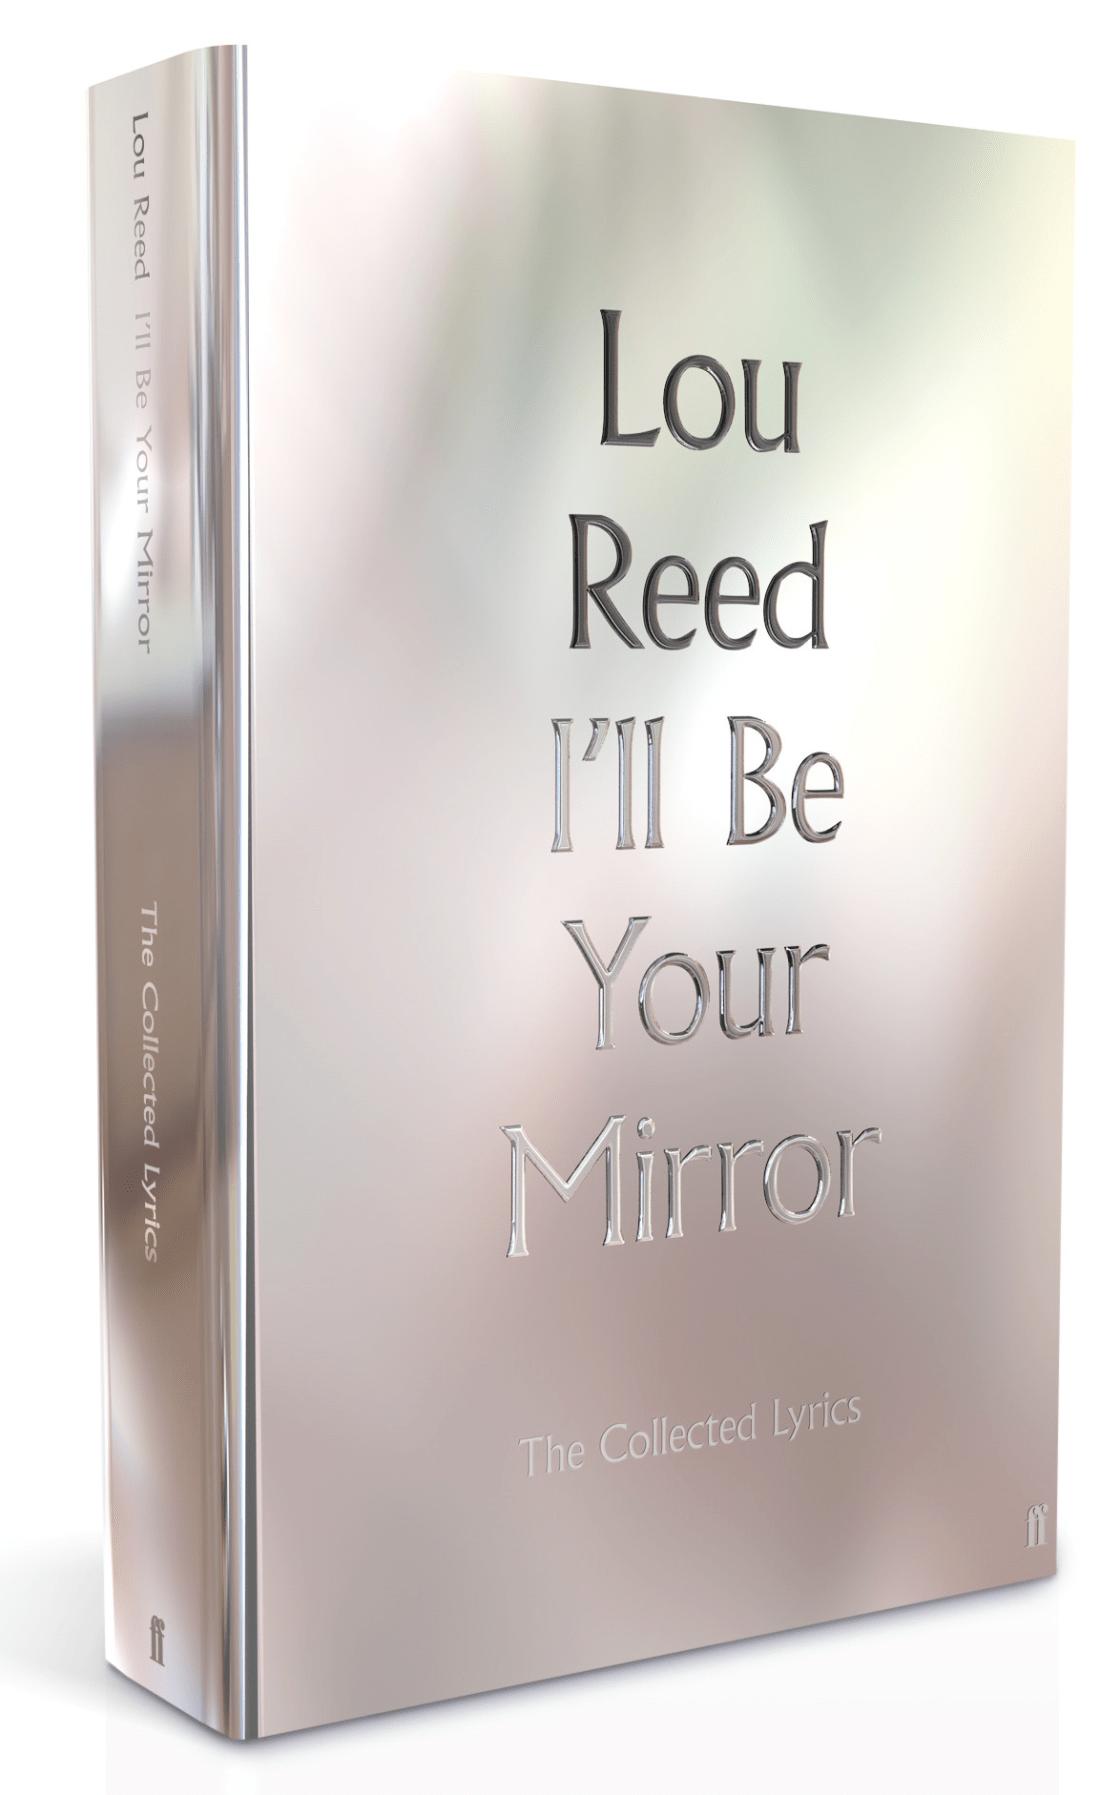 Lou Reed – Top Twenty music books